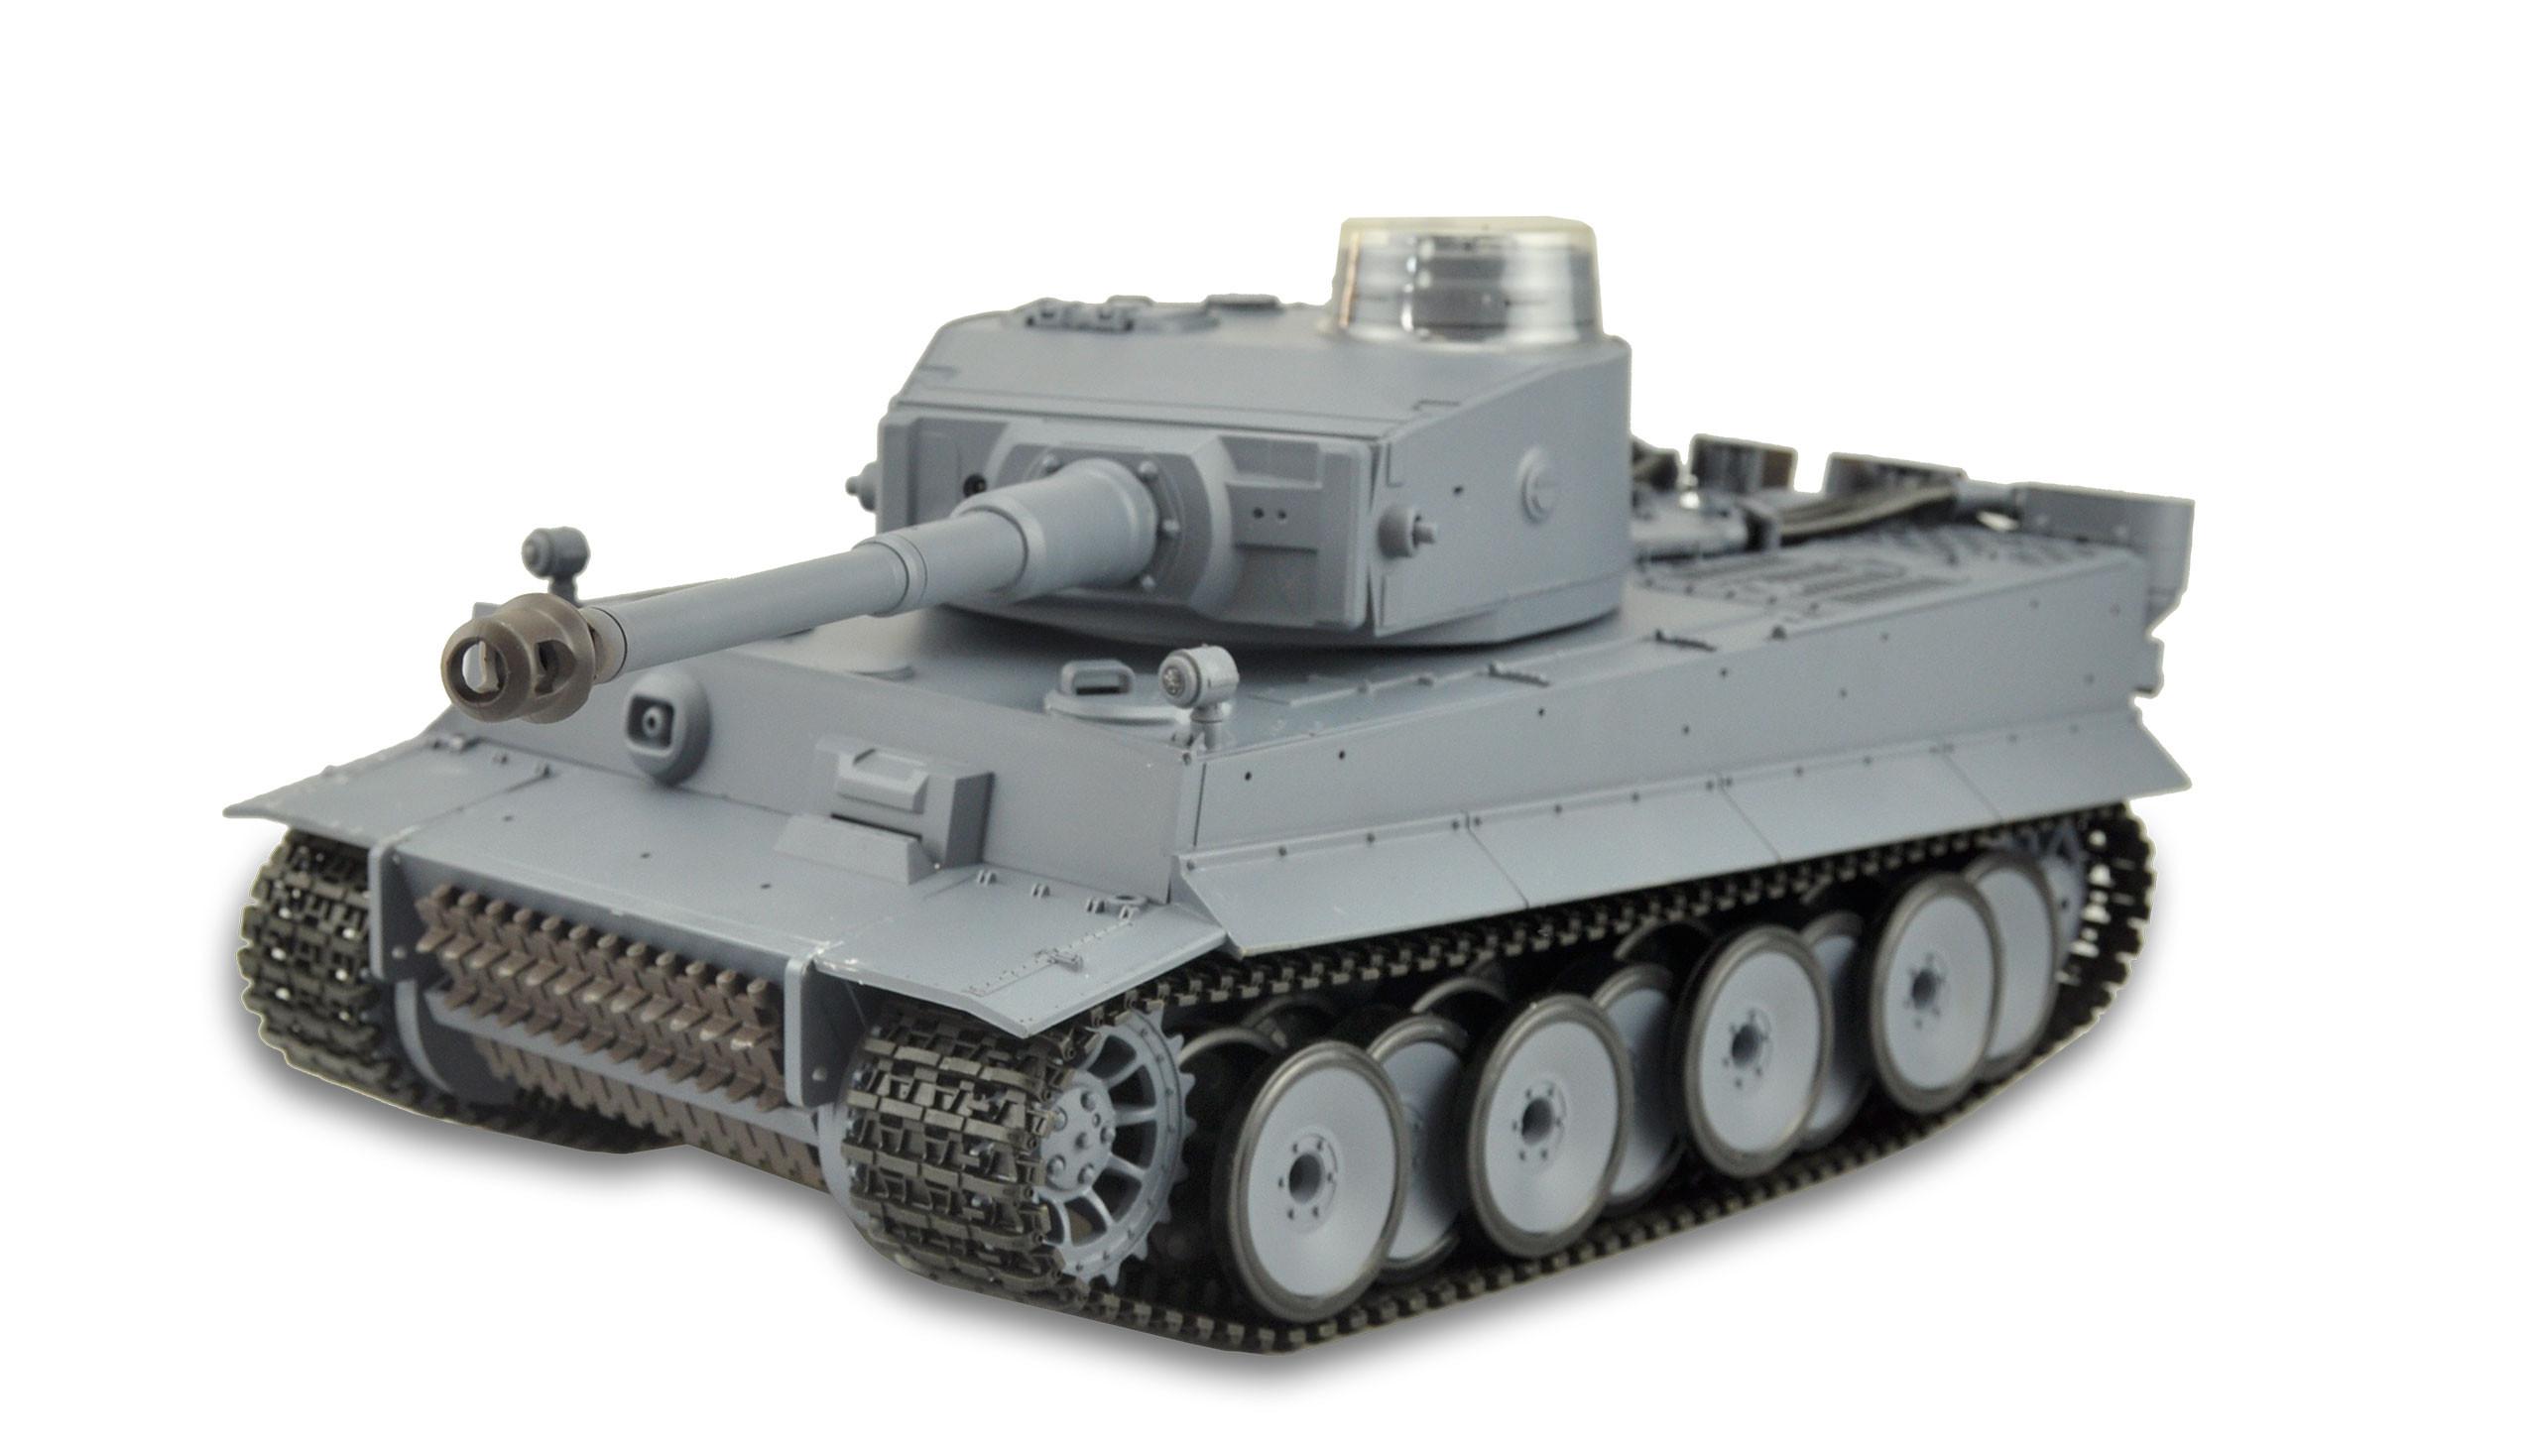 Amewi 23059 - Funkgesteuerter (RC) Panzer - Elektromotor - 1:16 - Betriebsbereit (RTR) - Grau